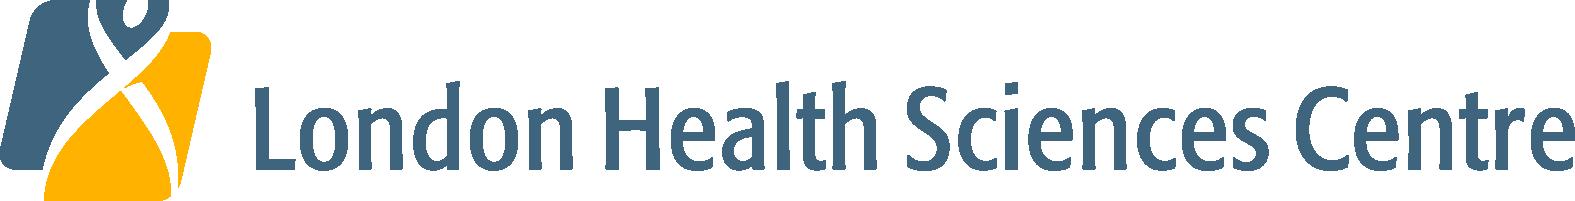 london health science